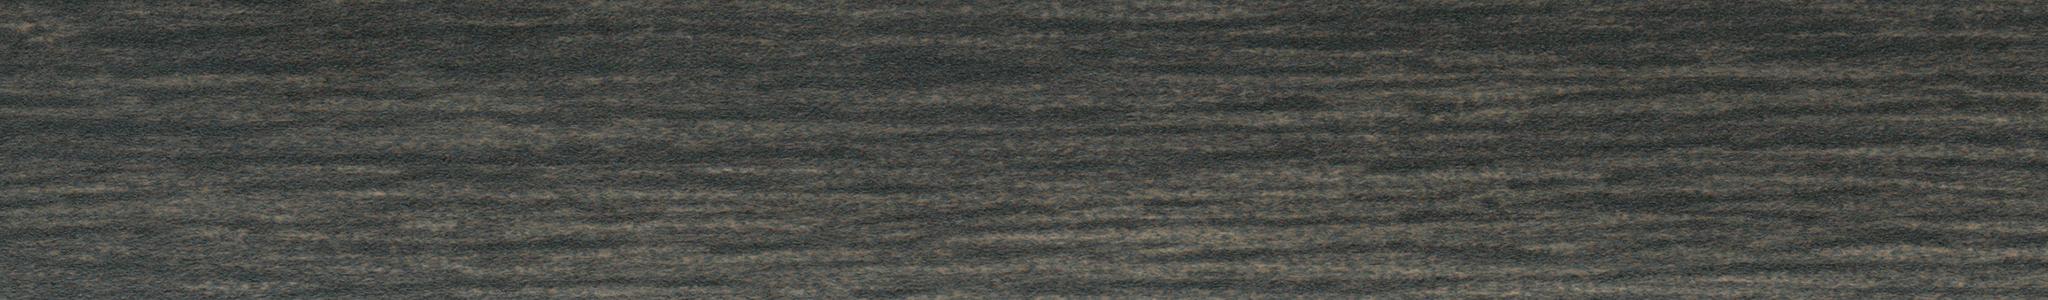 HD 243155 ABS hrana dub tabák perla